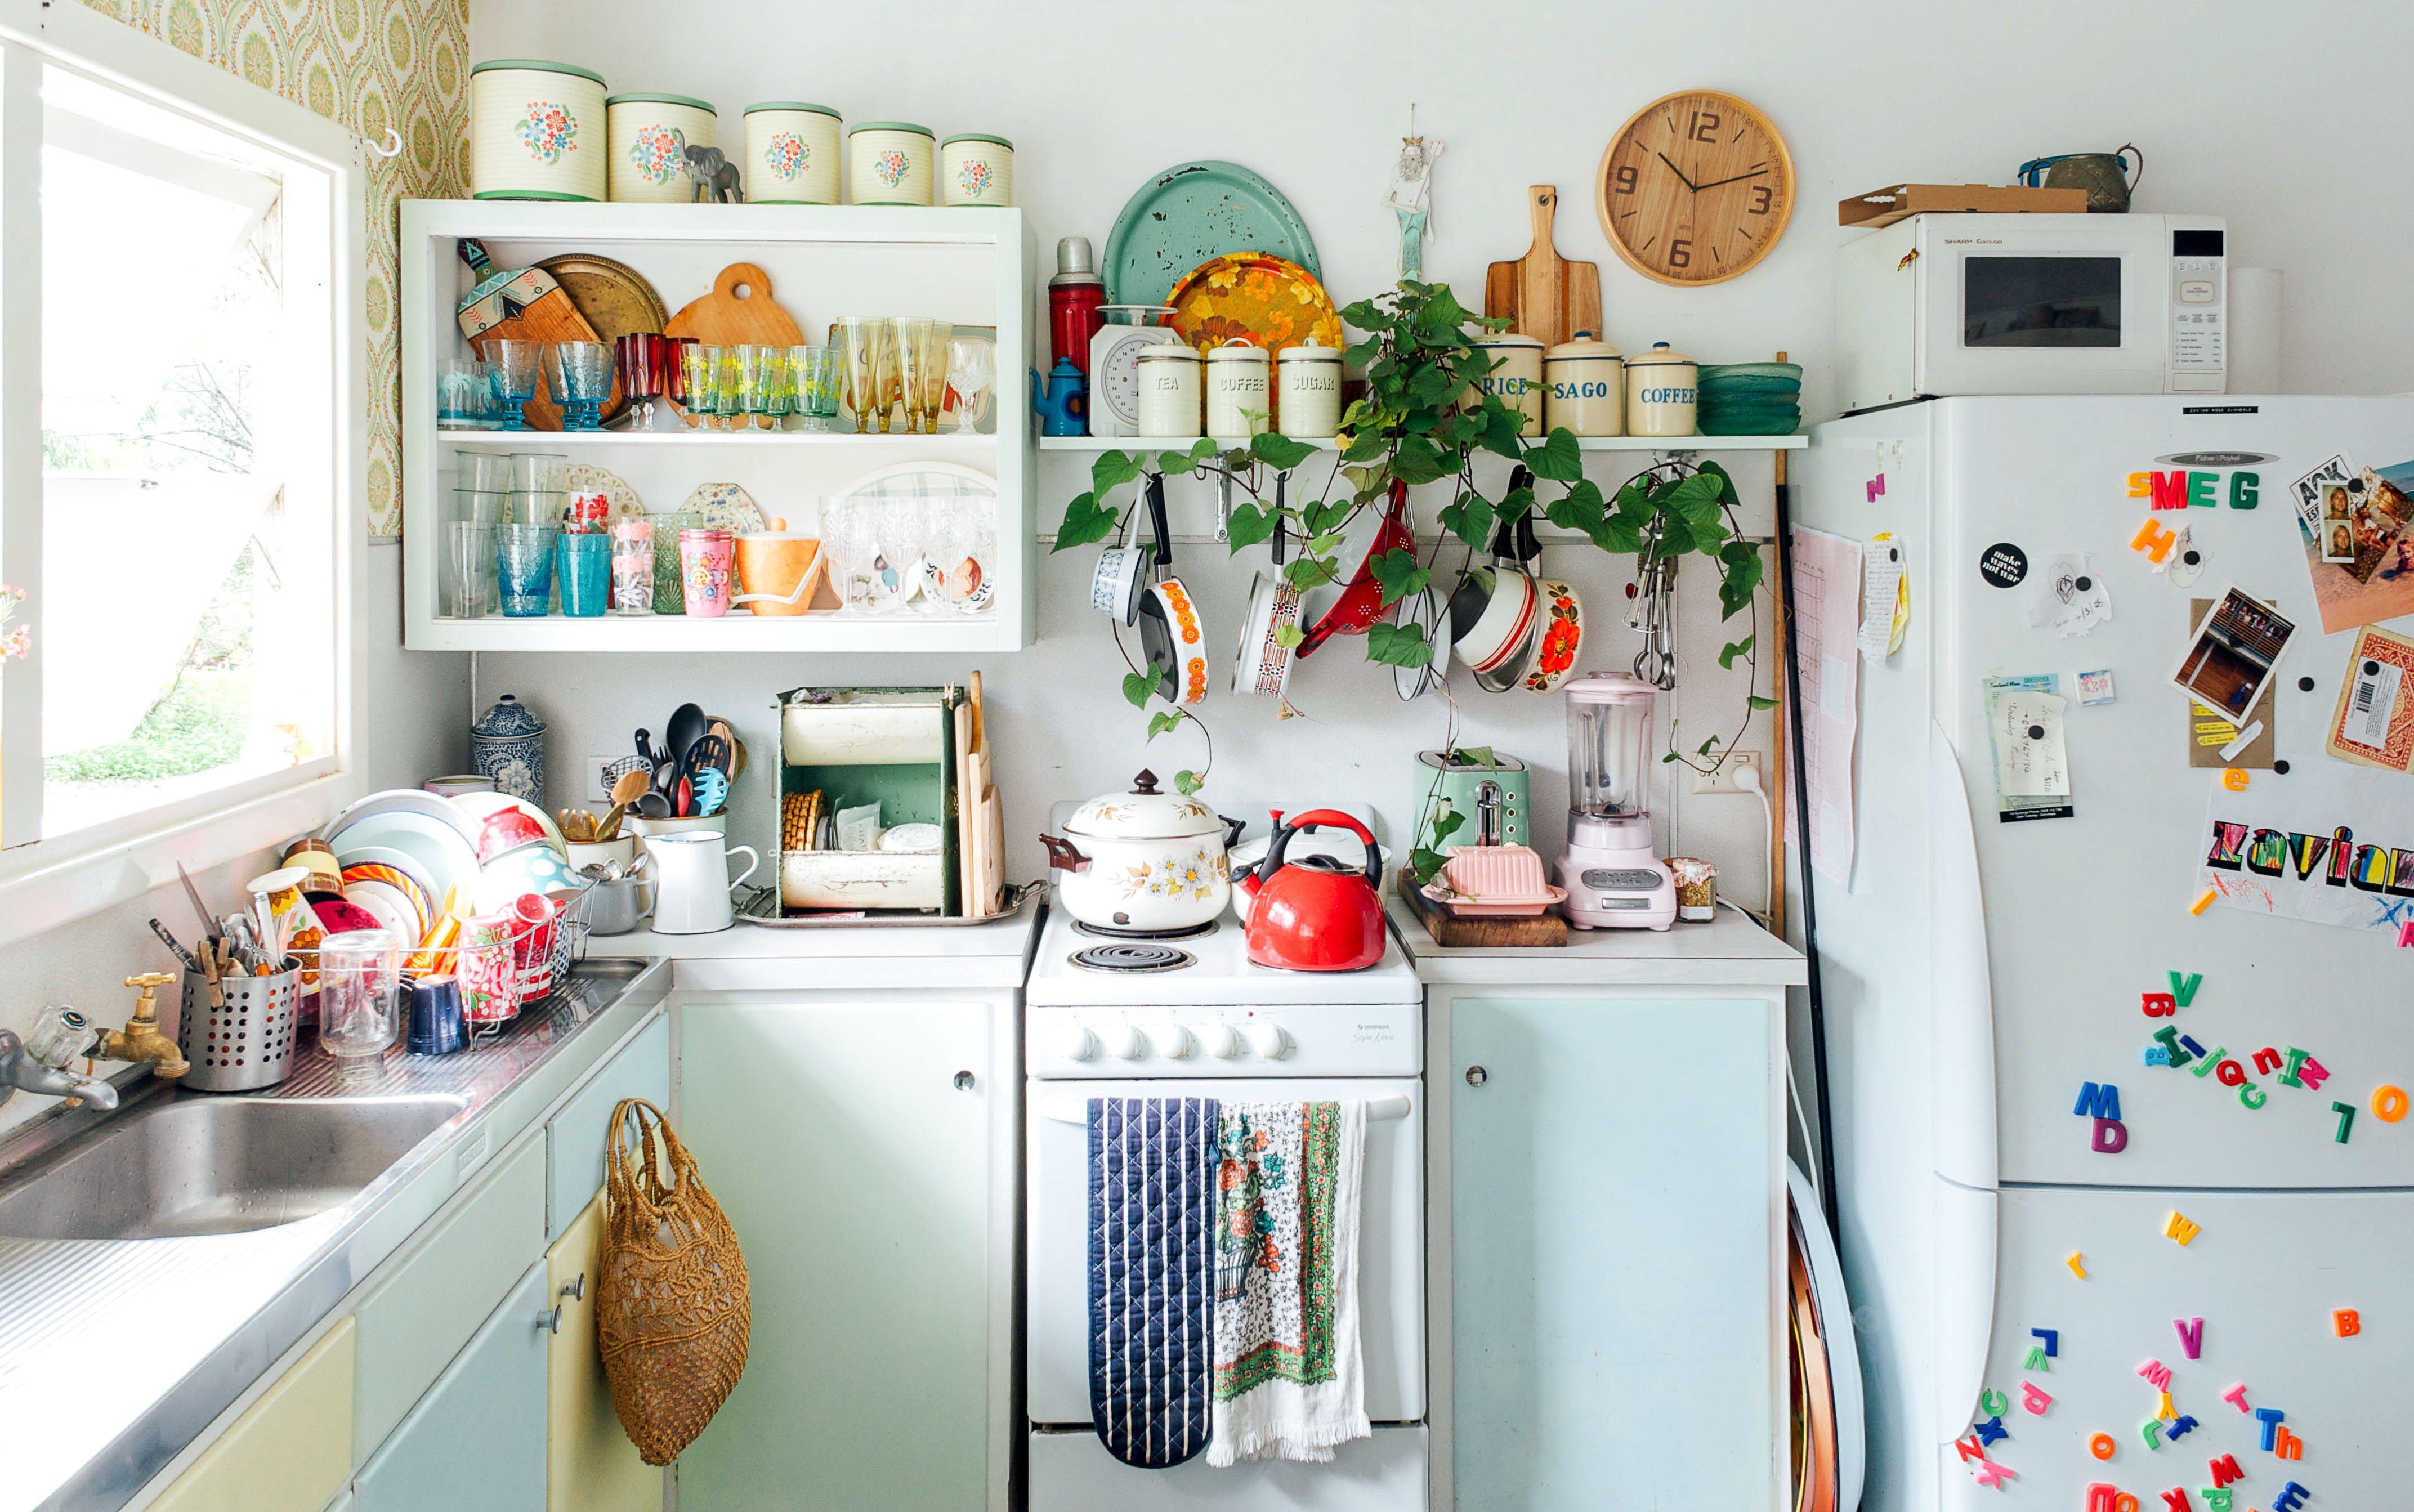 Image result for cluttered kitchen - HD images